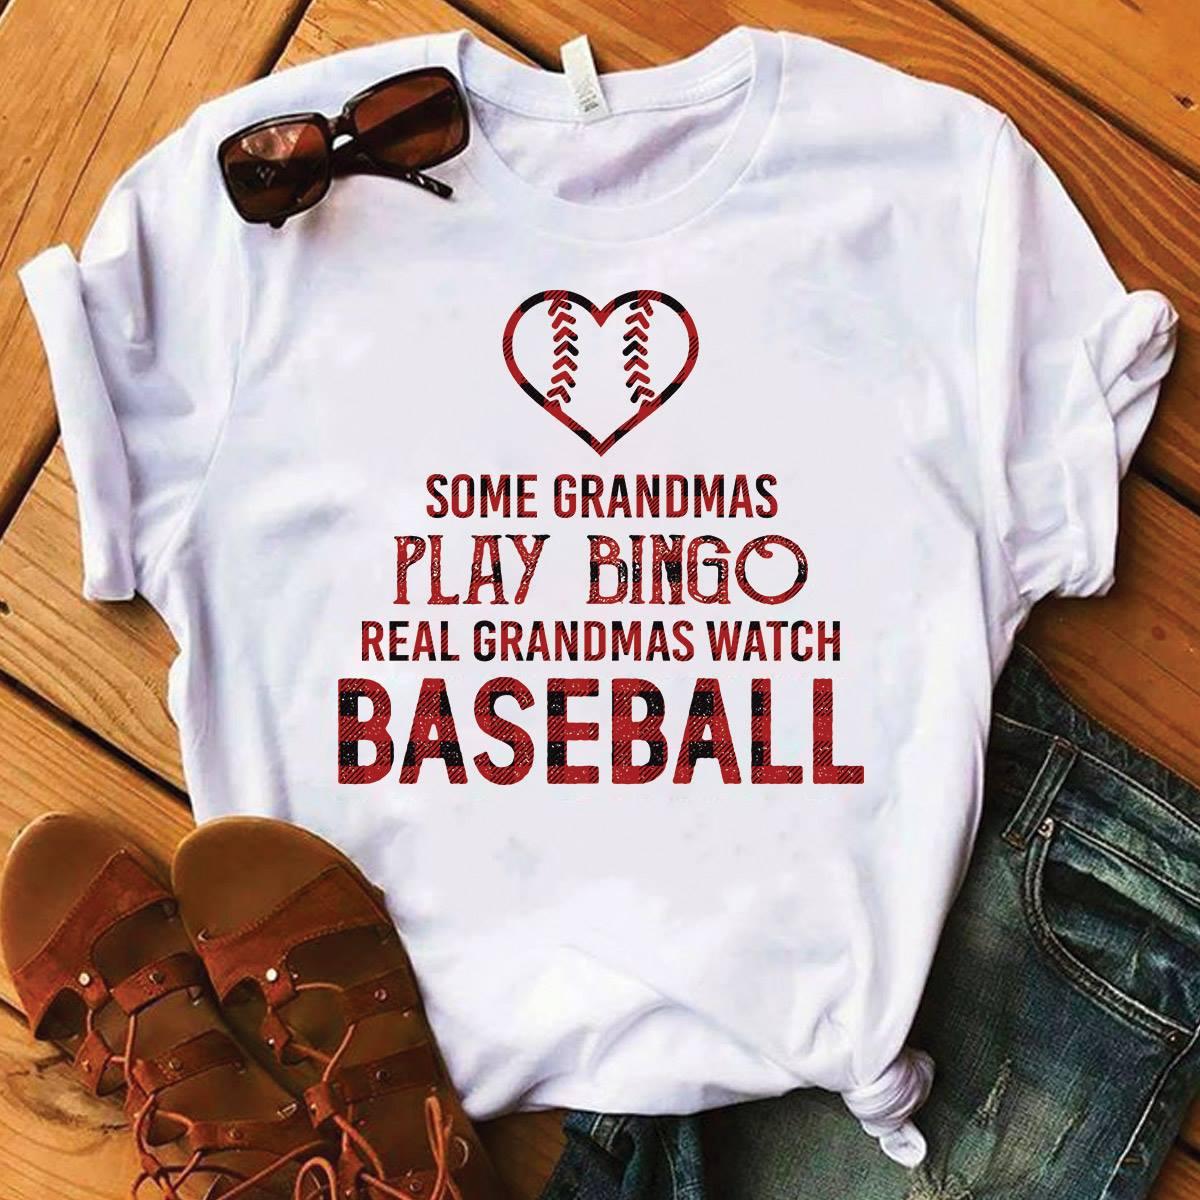 Real Grandmas Watch Baseball Shirt